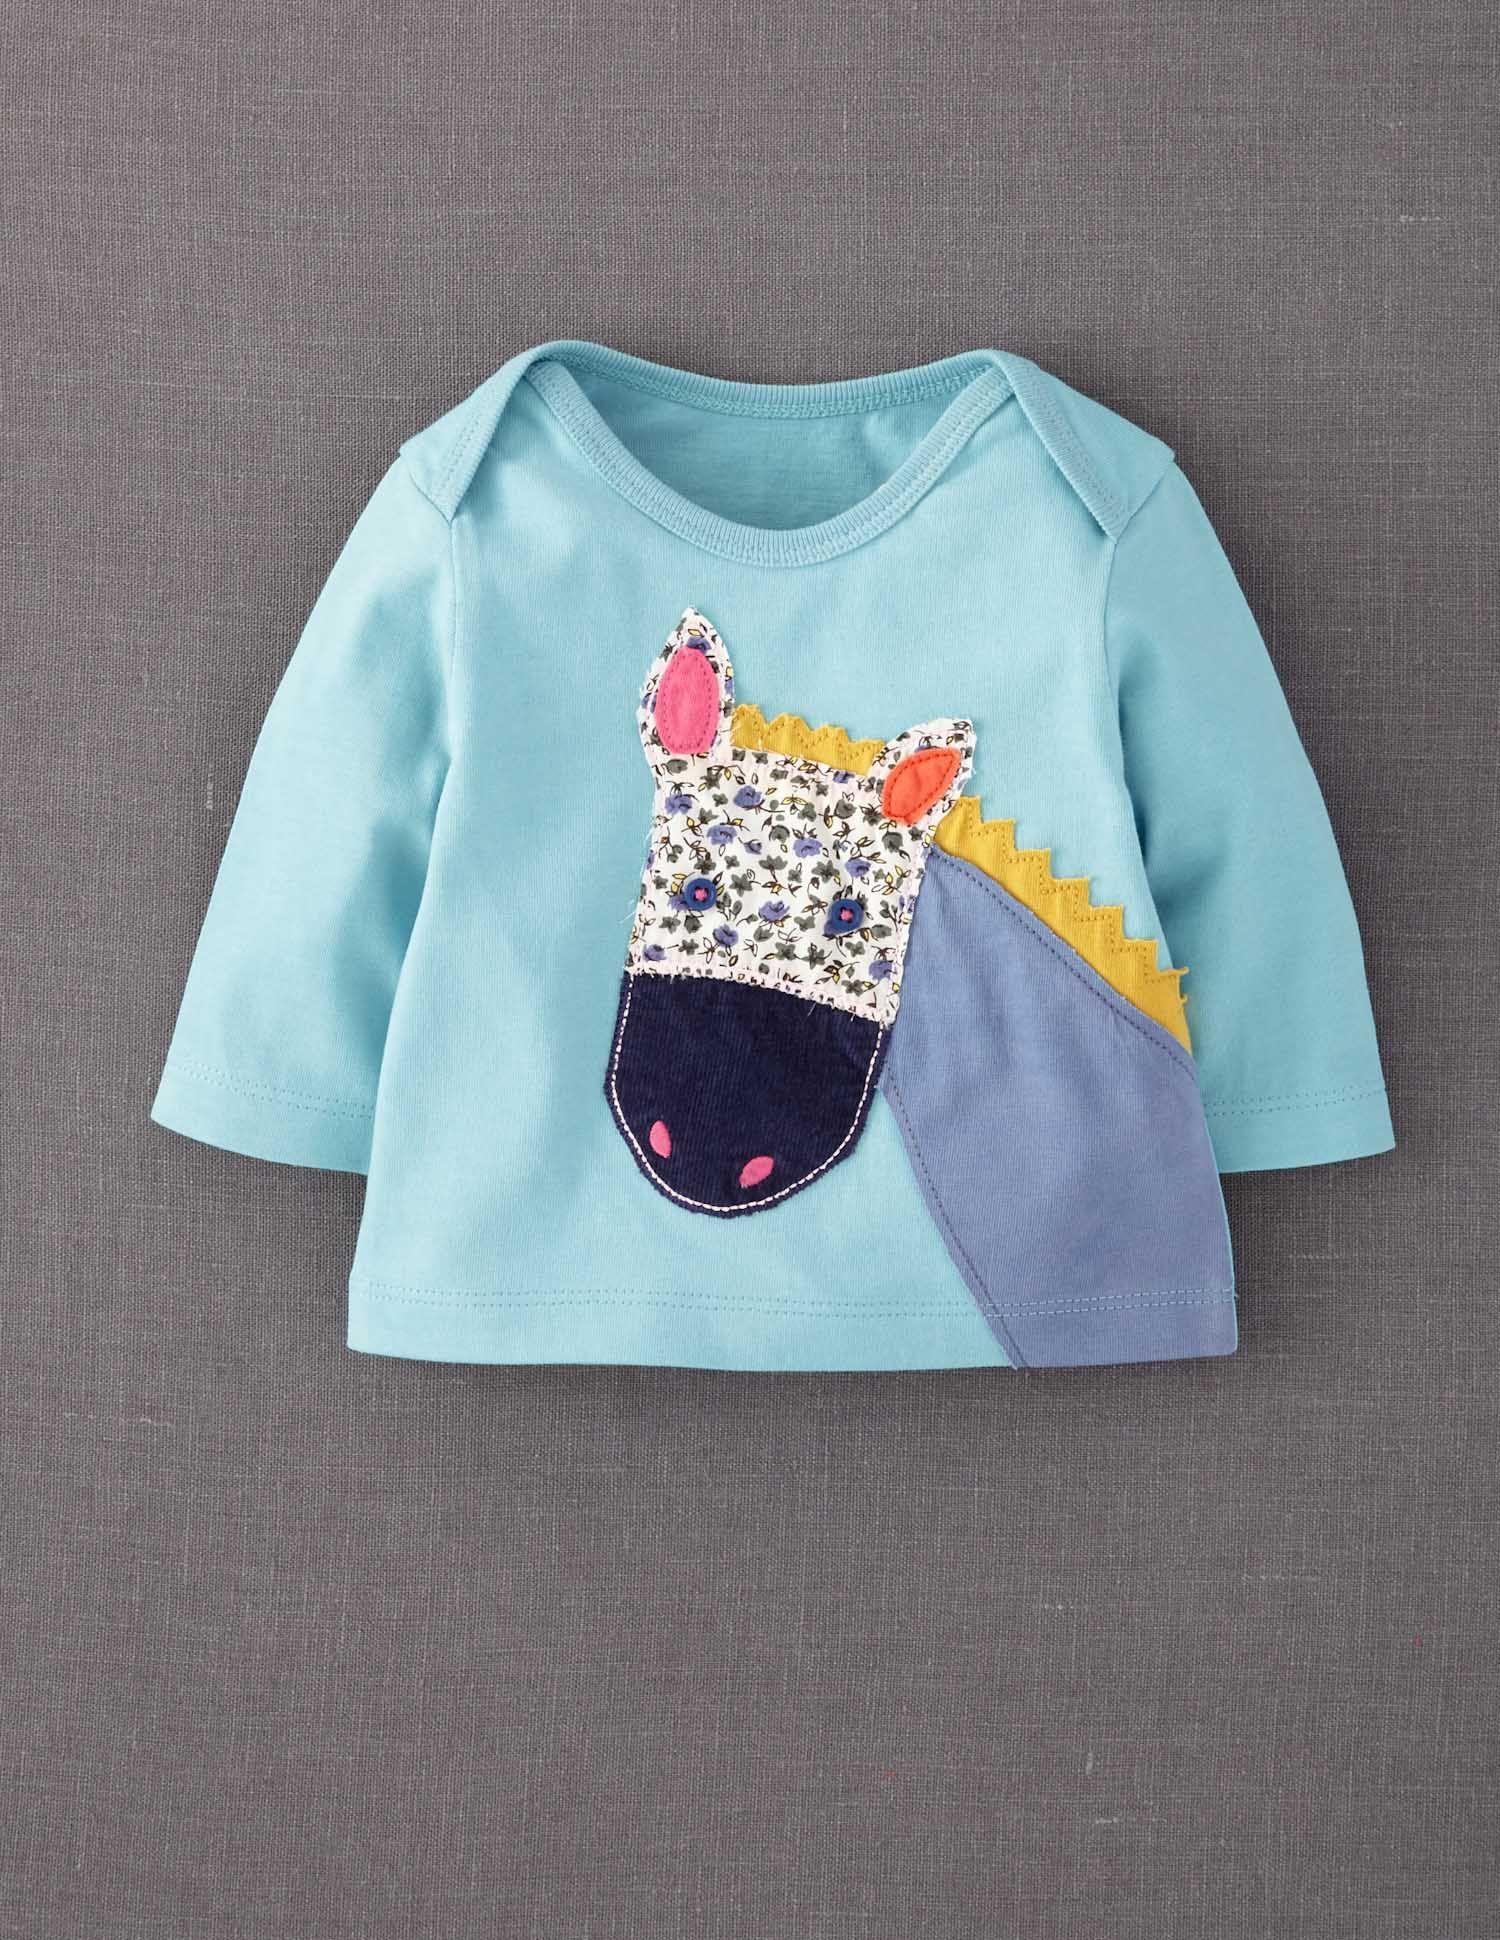 Shirt mit Tierapplikation | Lust auf Nähen | Pinterest | Shirts ...